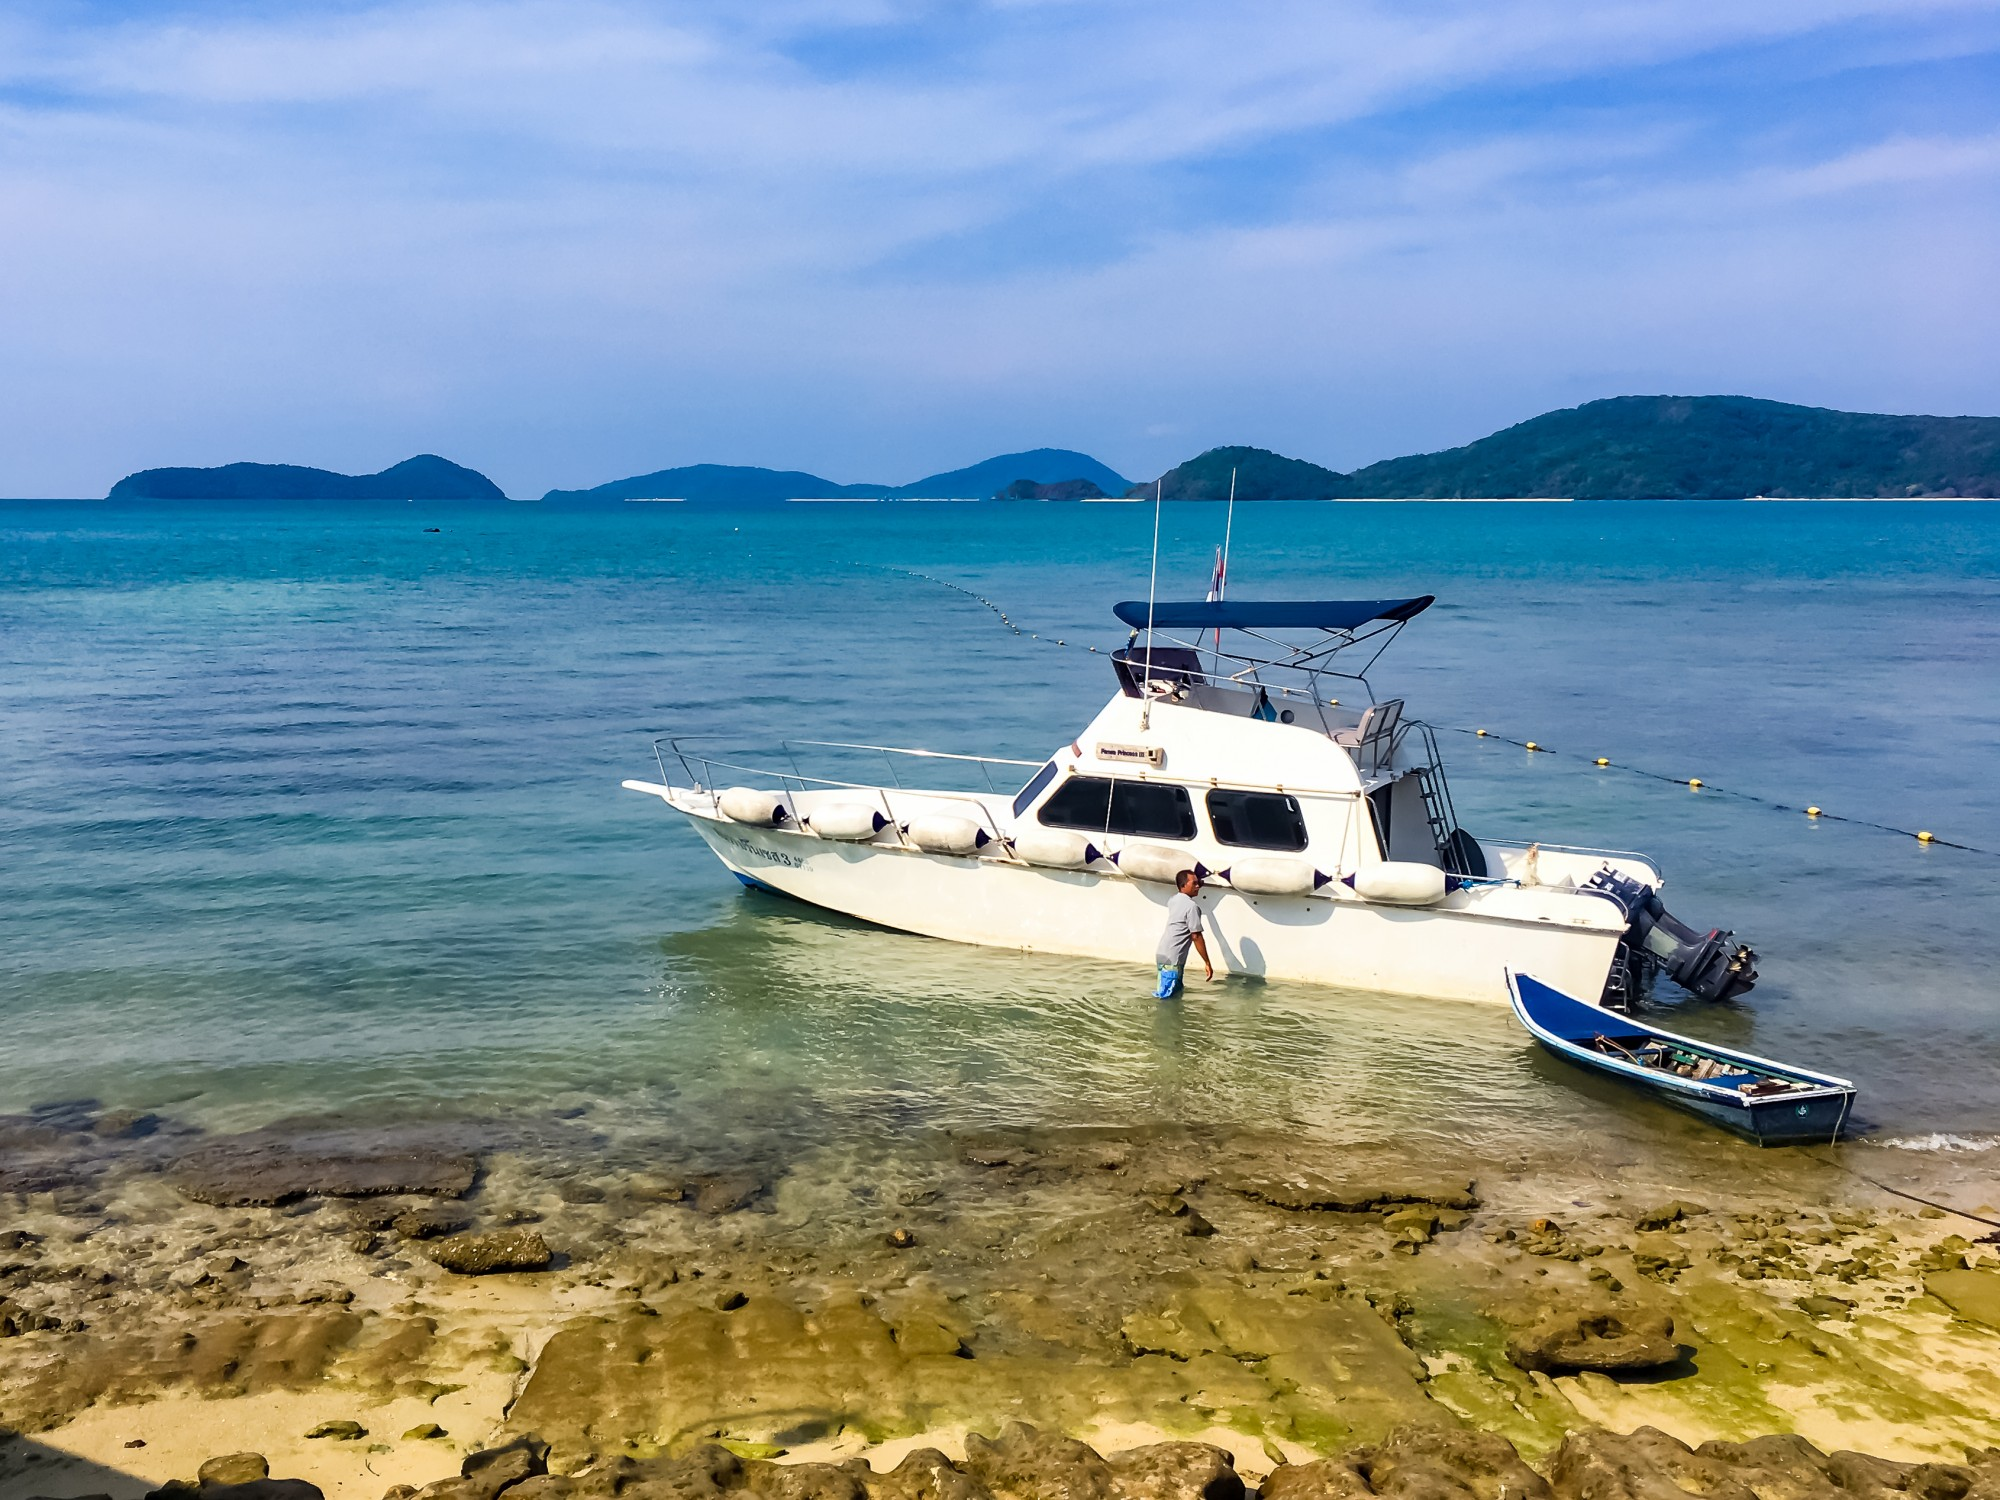 Coral Island Trip, Phuket, Thailand